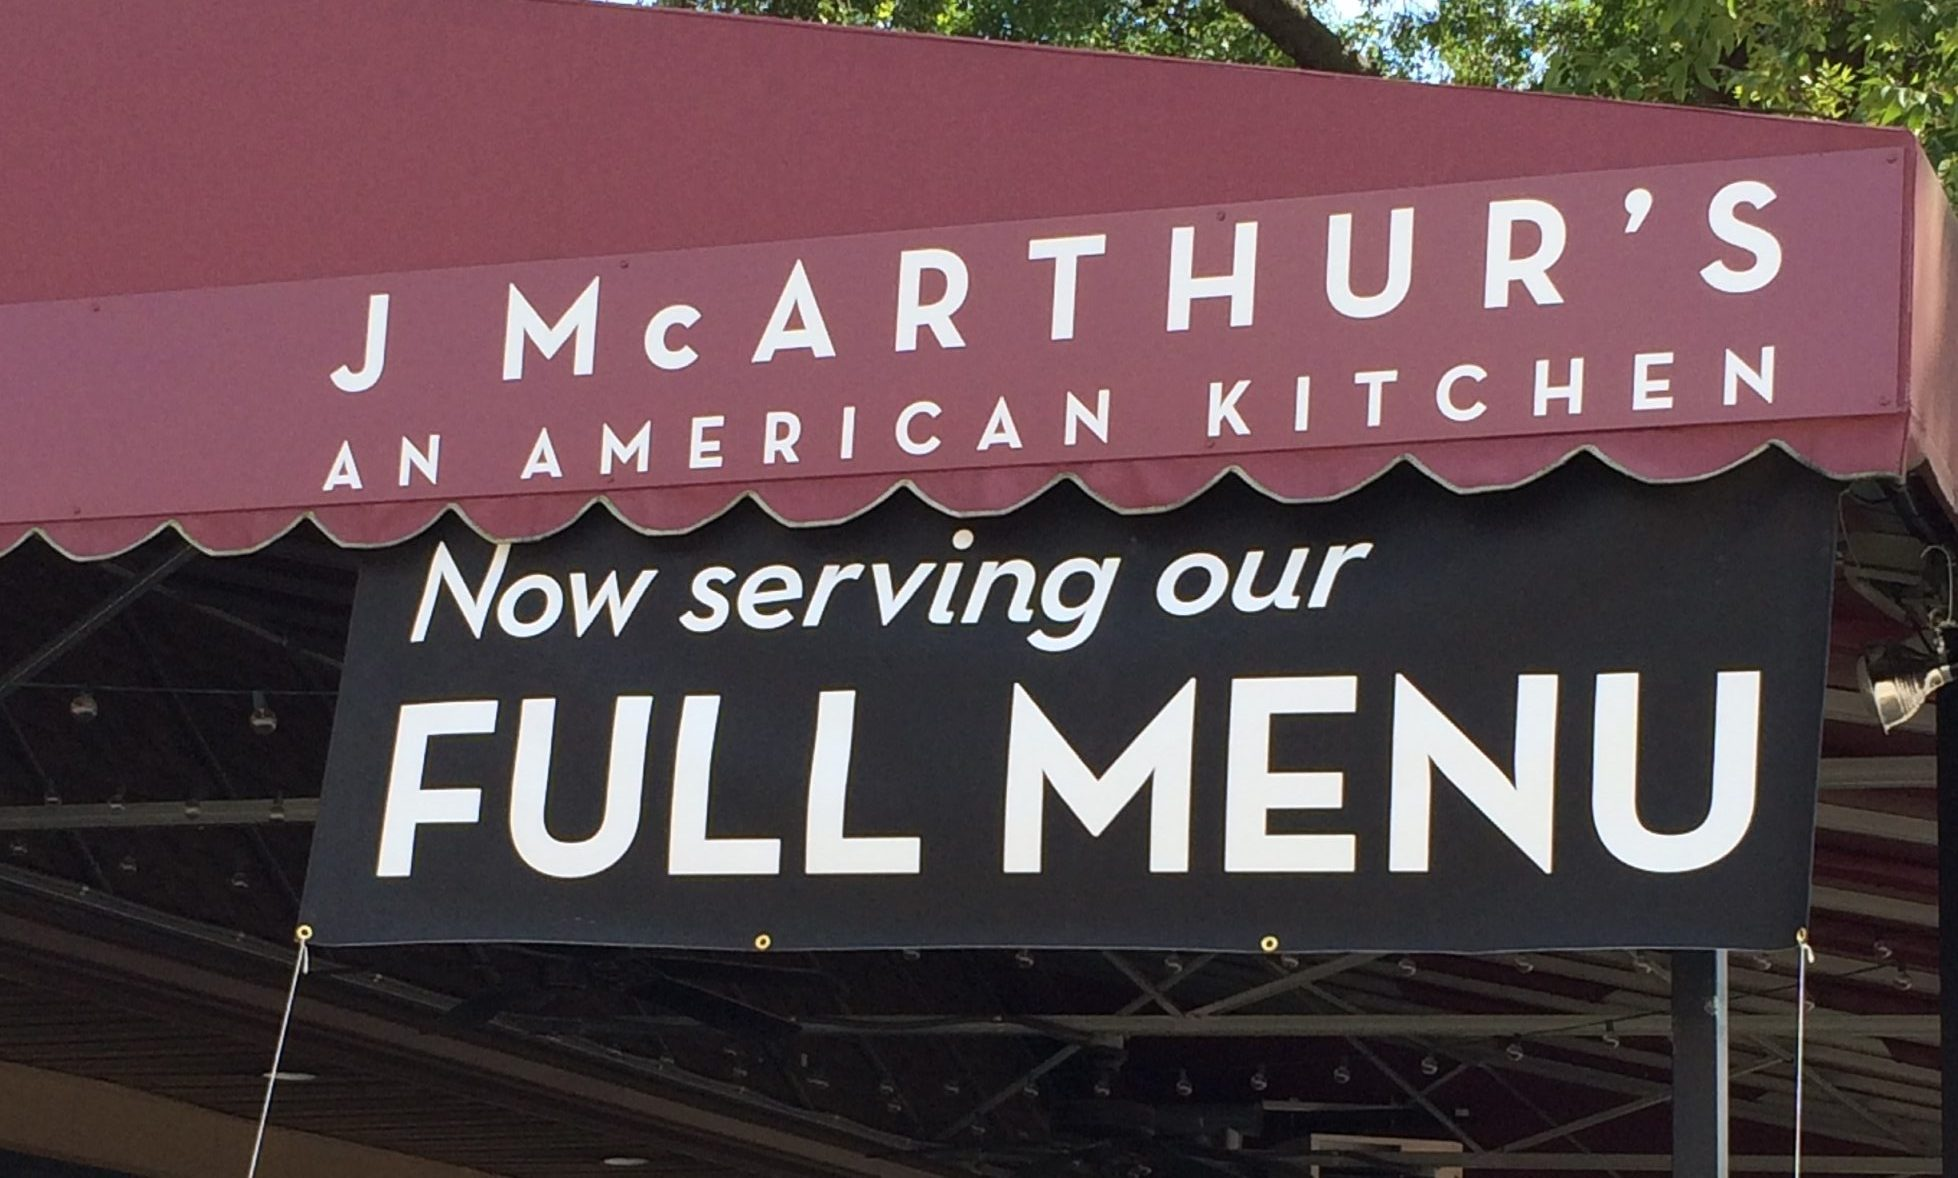 J McArthur's - An American Kitchen